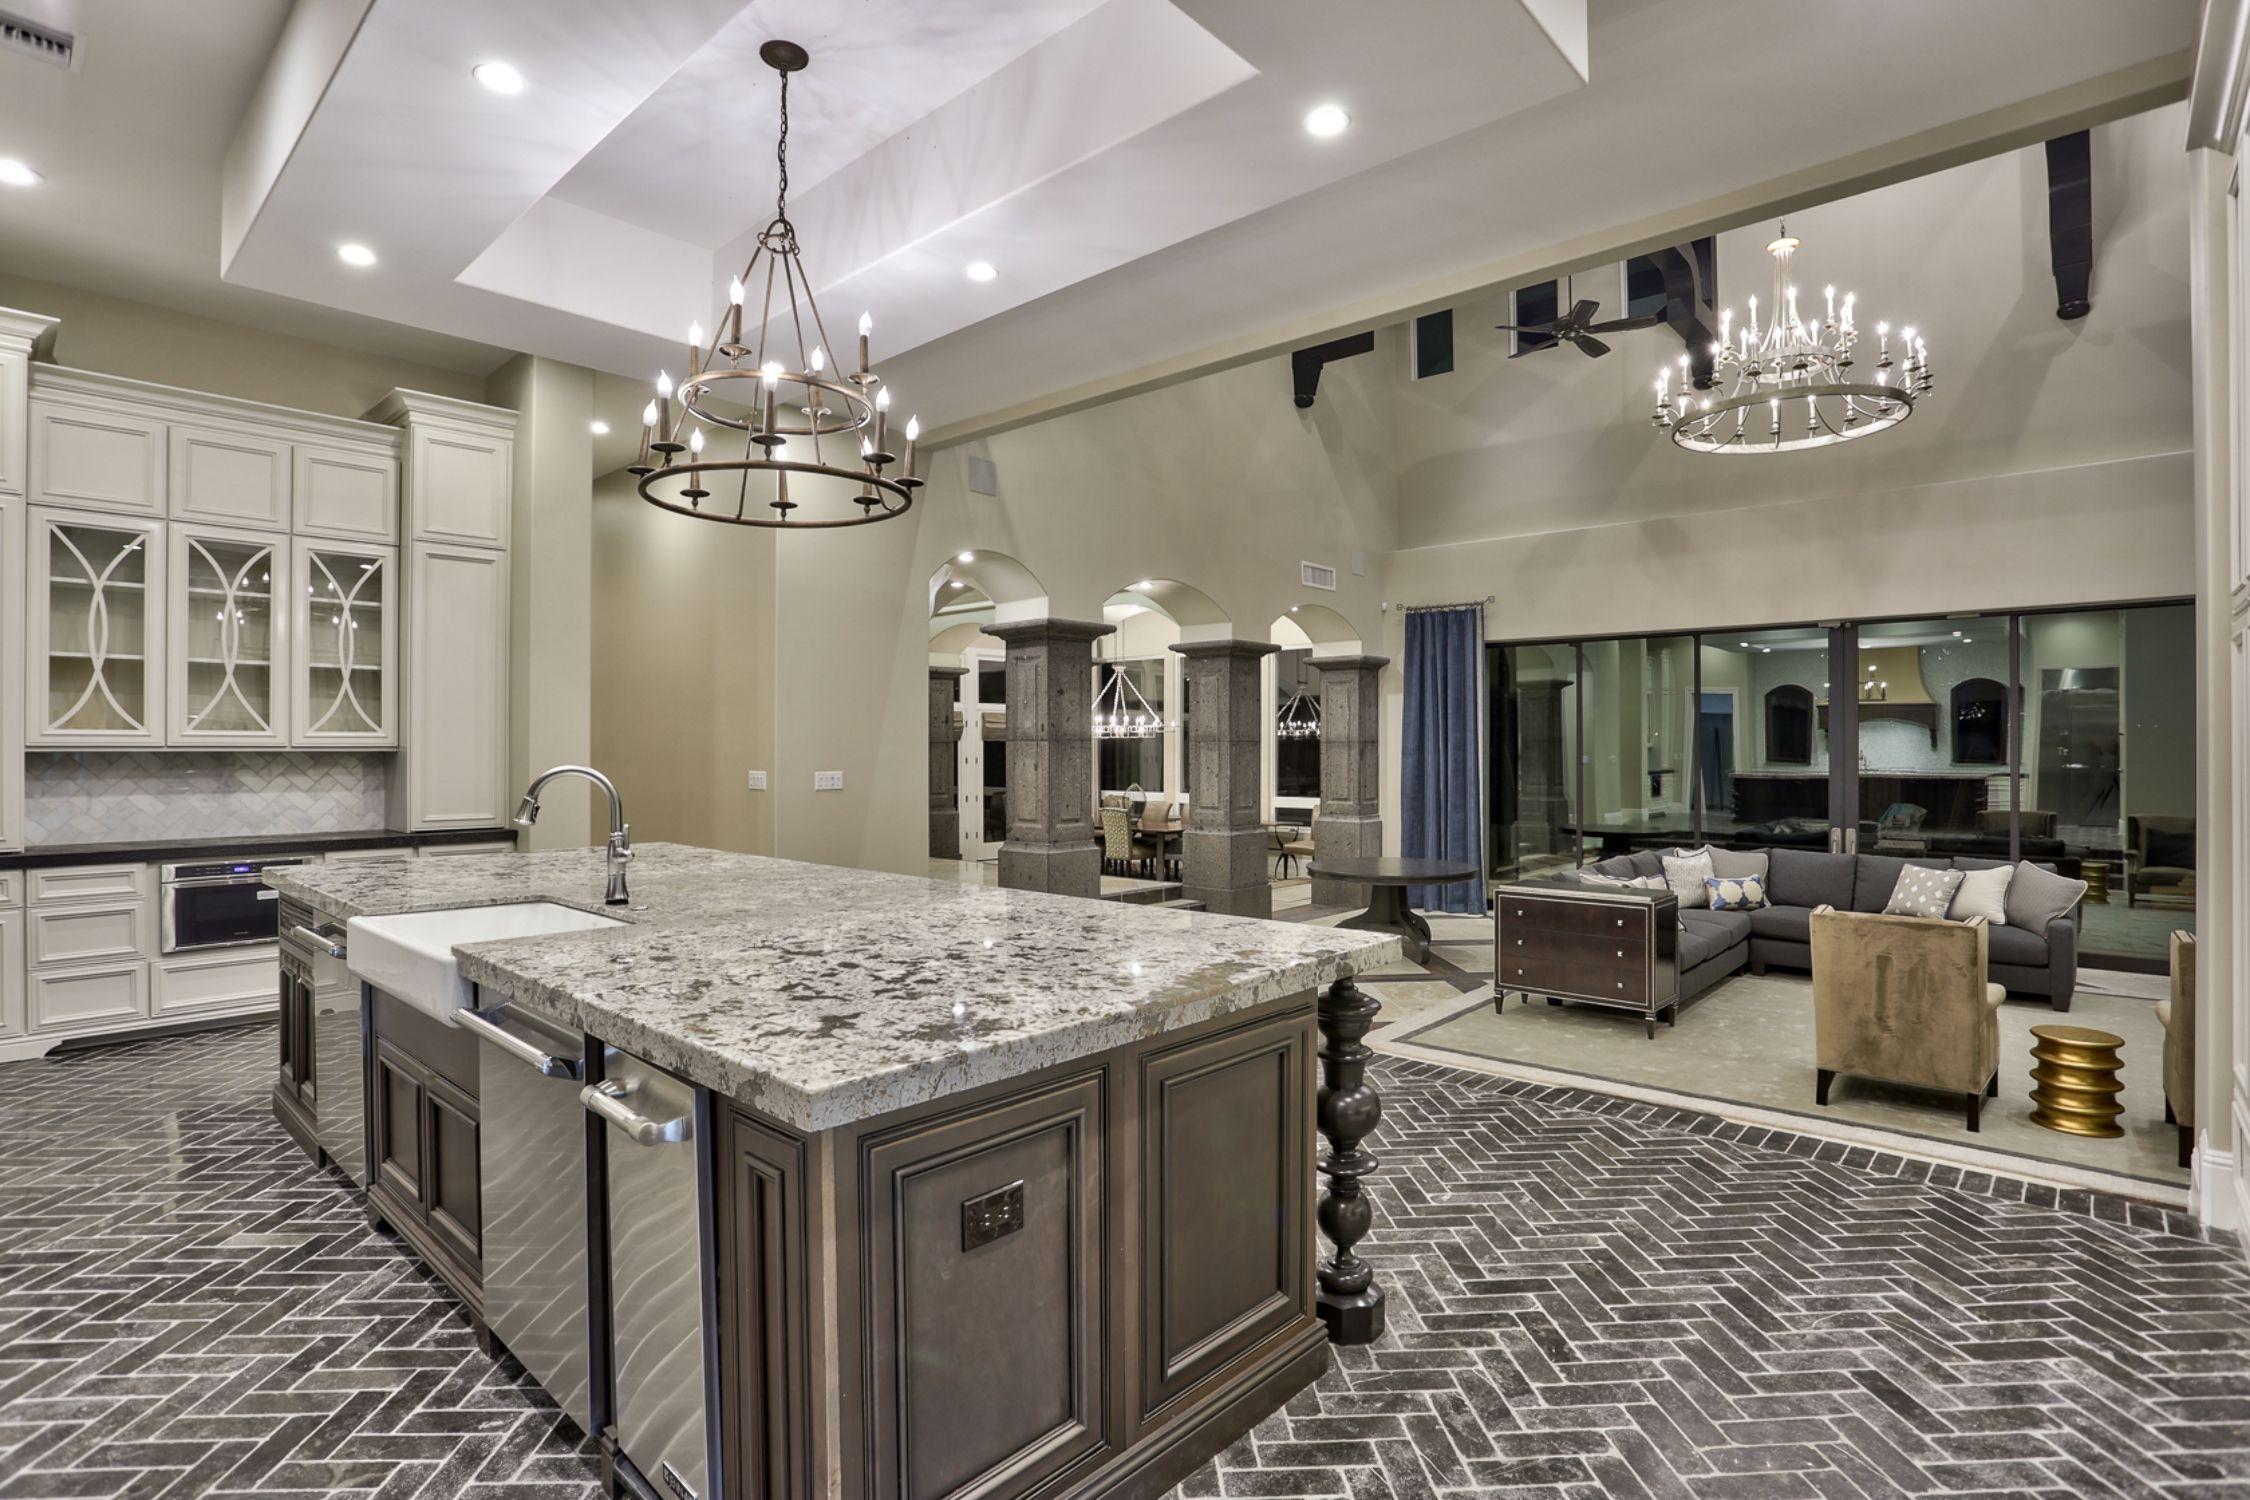 Transitional home design gourmet kitchen steps down for Gourmet kitchen design